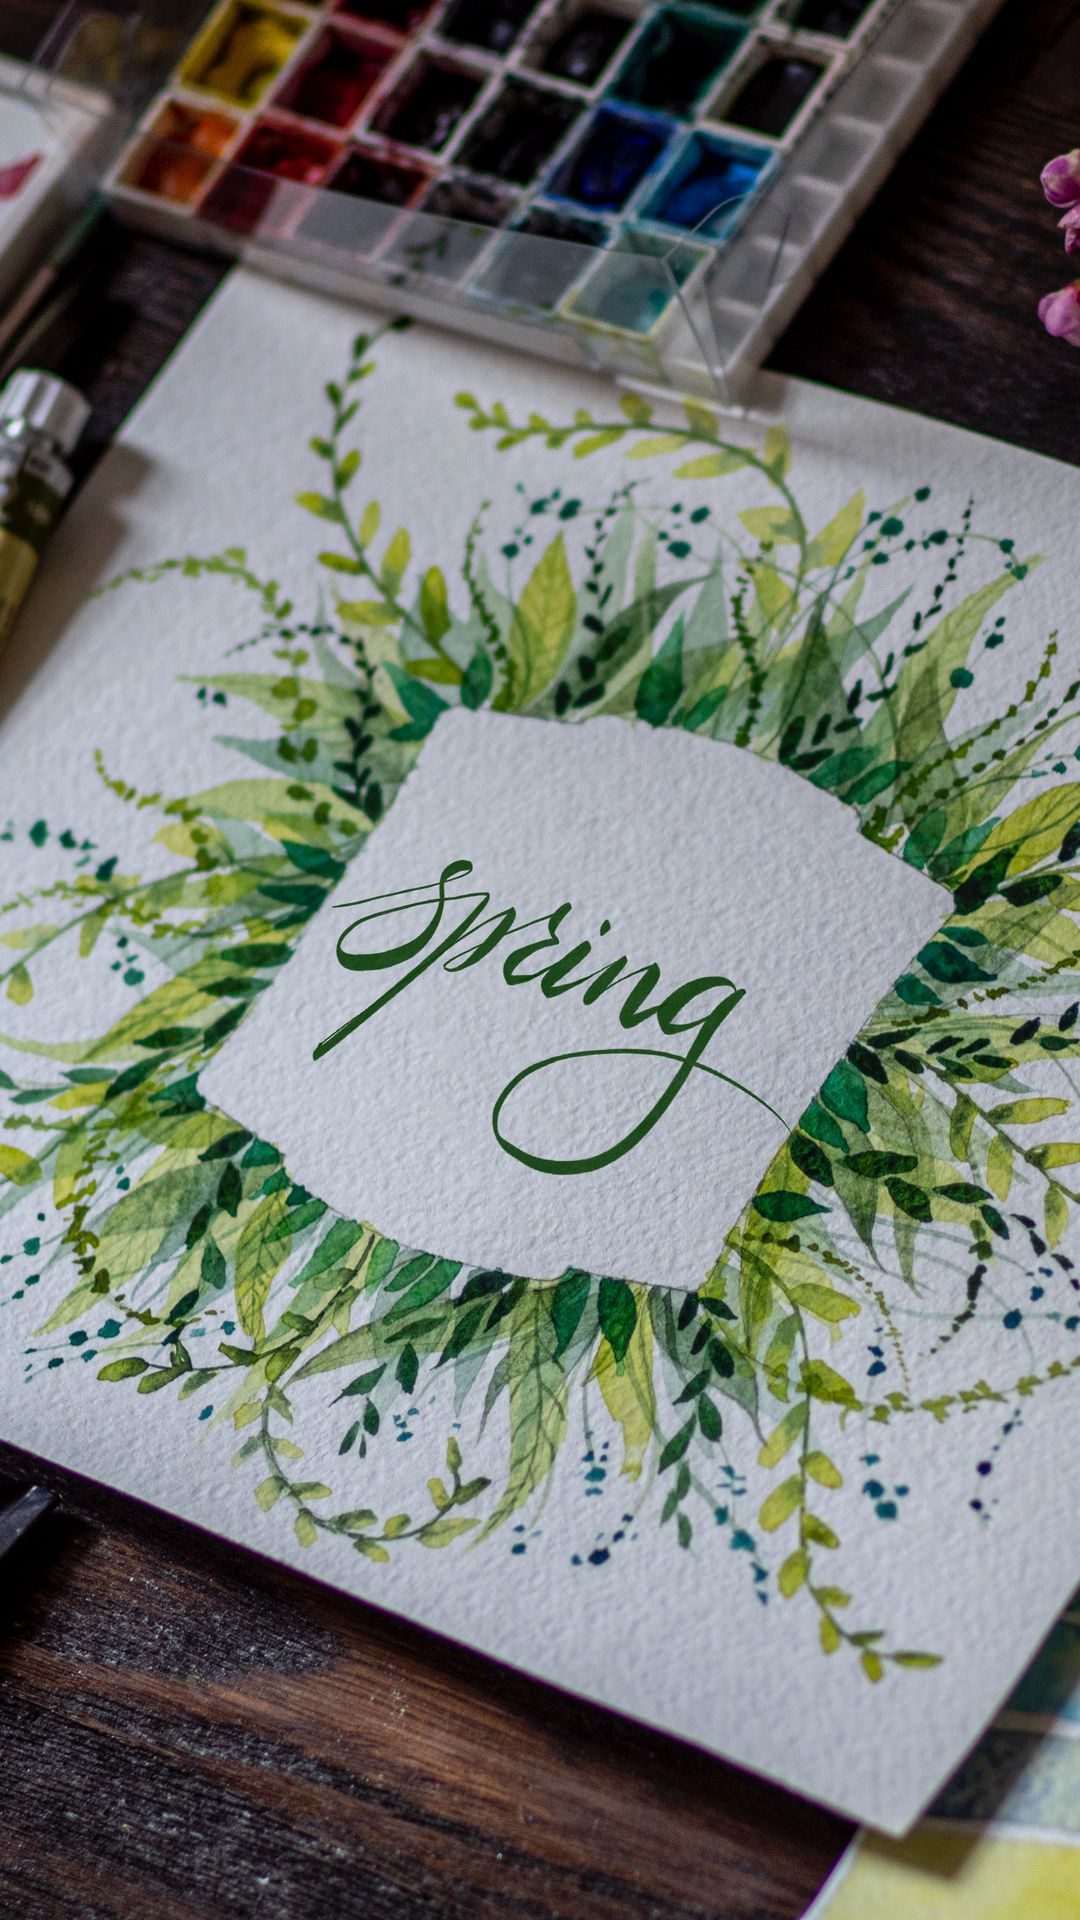 1080x1920 Обои весна, слово, леттеринг, краски, акварель